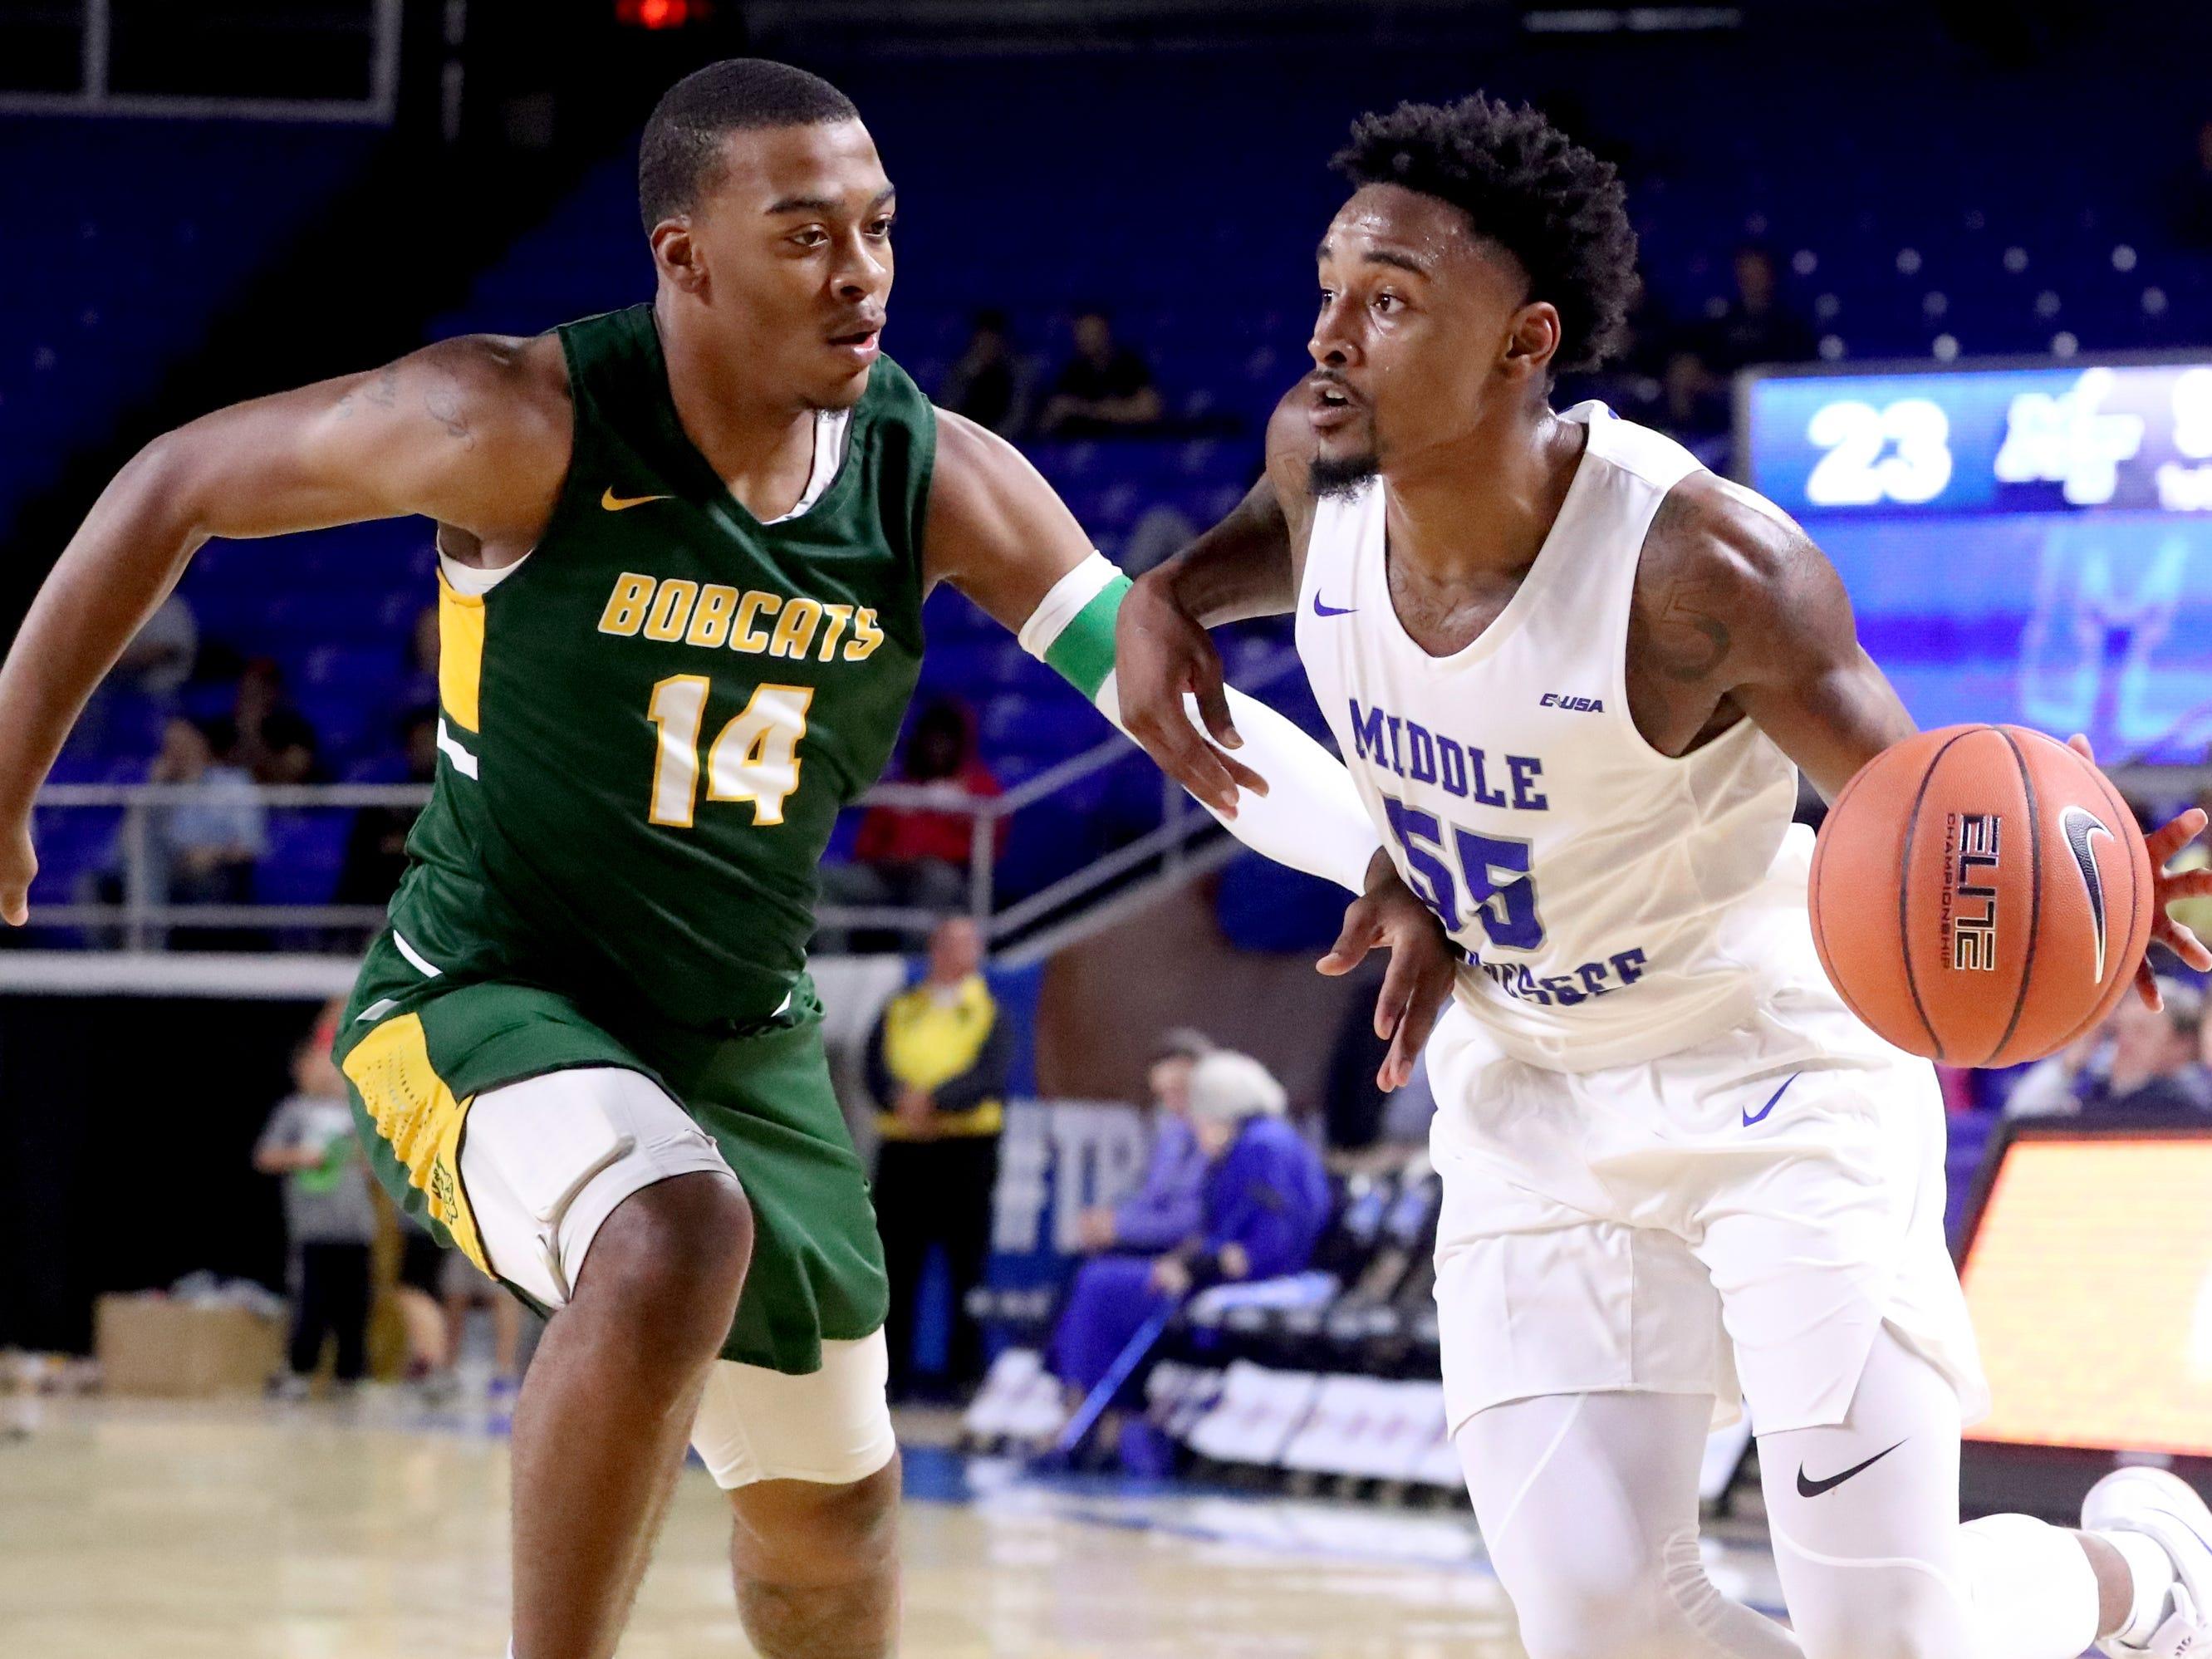 MTSU's Antonio Green (55) pushes toward the basket as Lees-McRae's Malik Wright (14) guards him on Tuesday, Nov. 6, 2018.